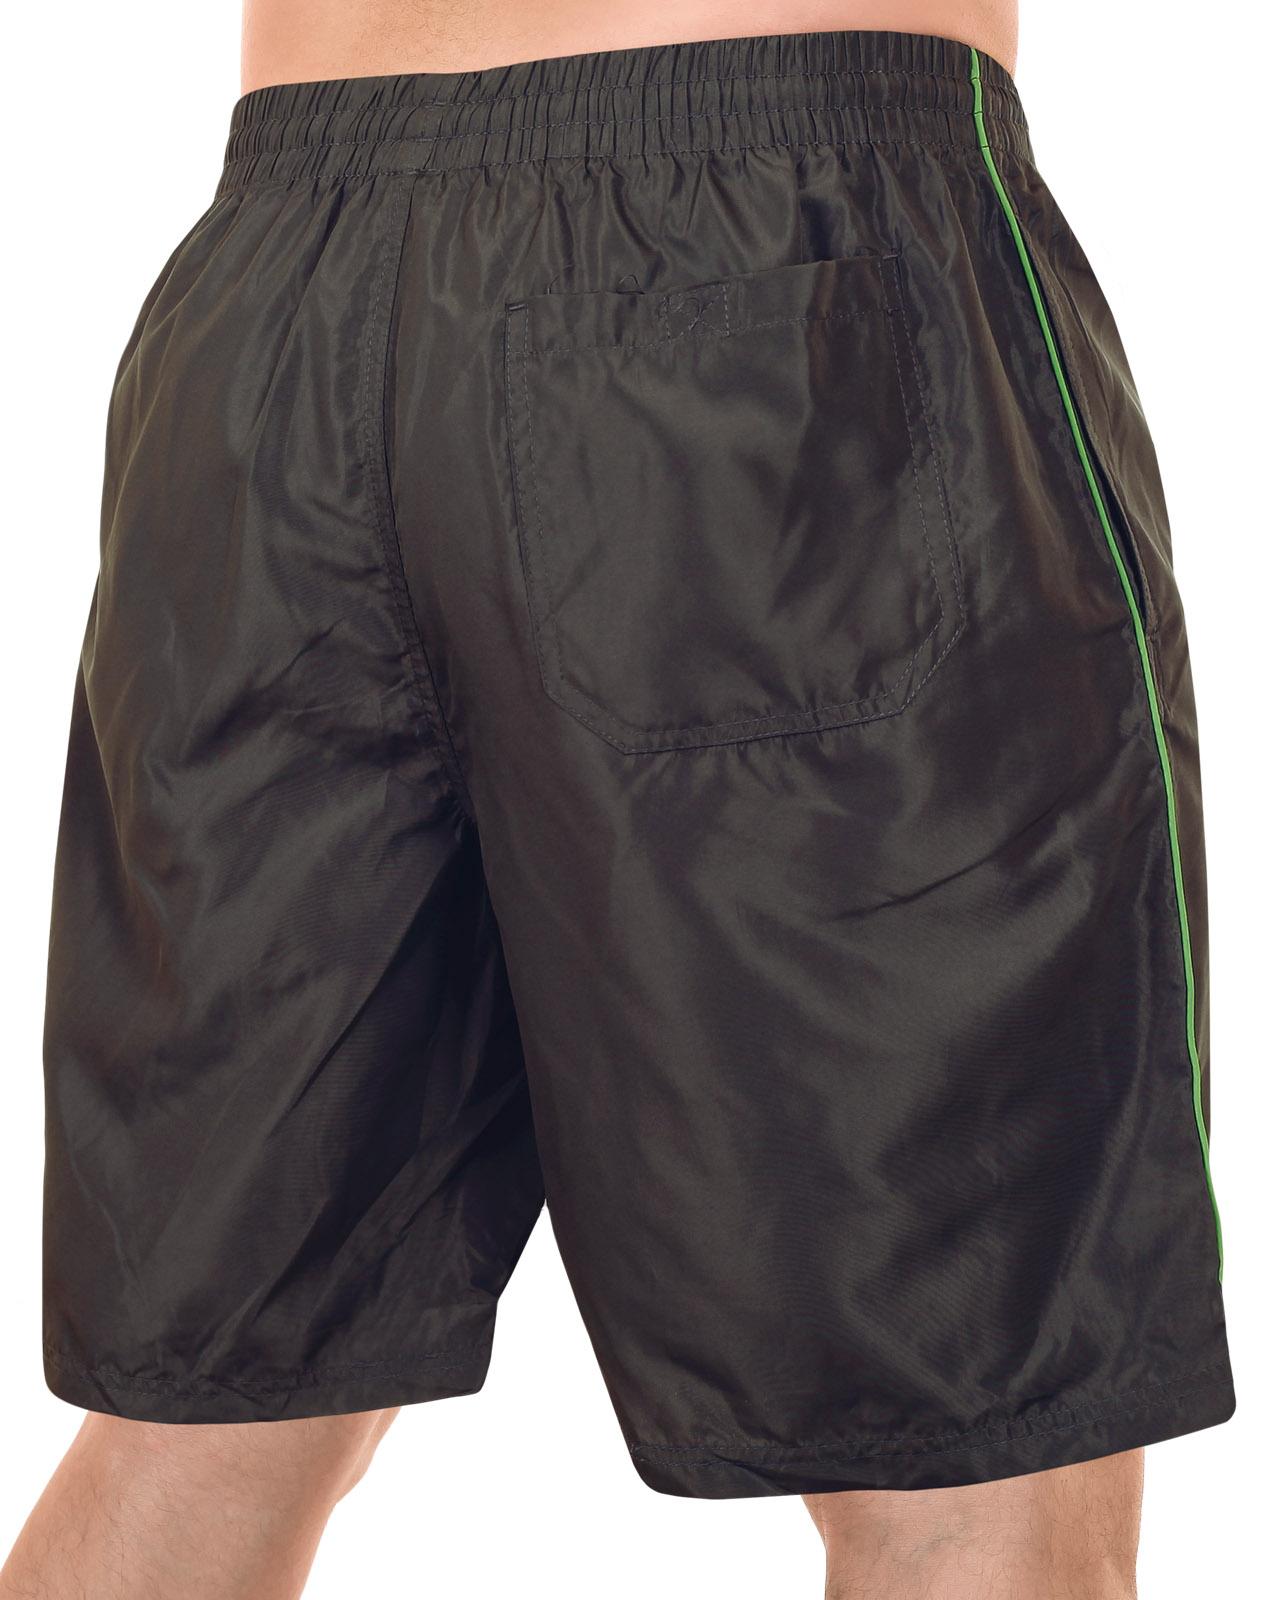 Убойные шорты для крутых парней от MACE (Канада)